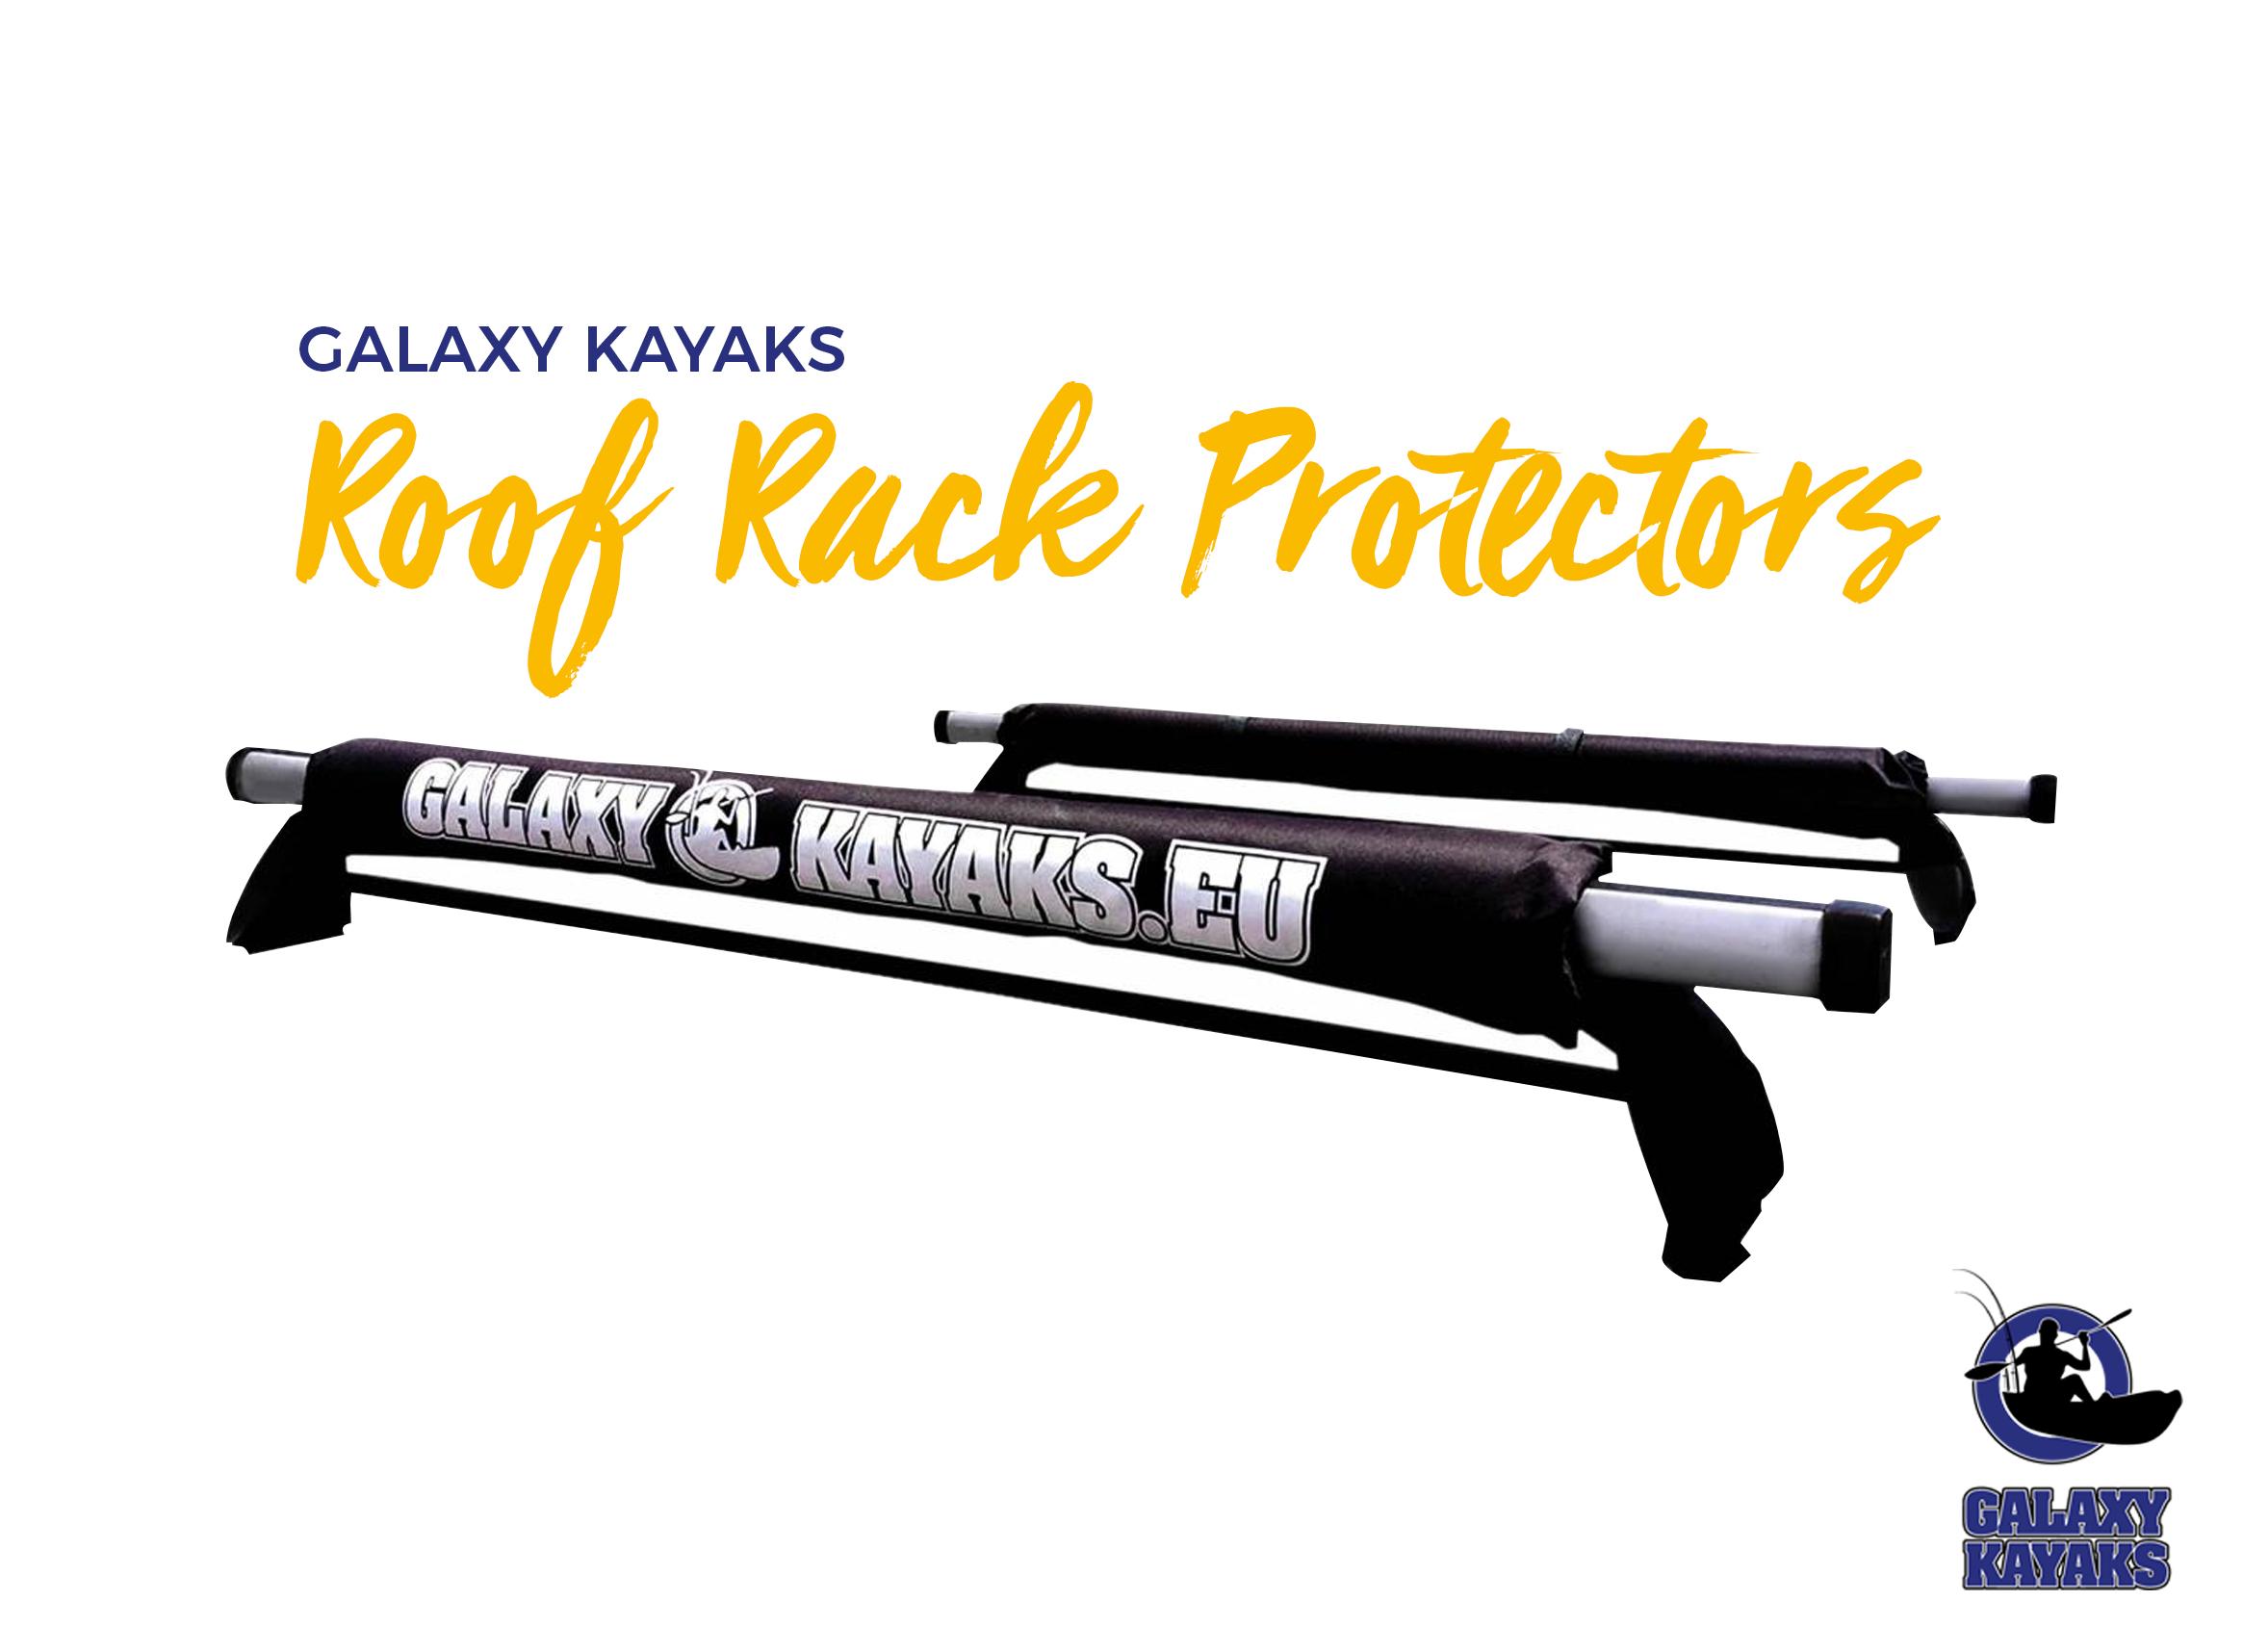 Roof Rack Protectors